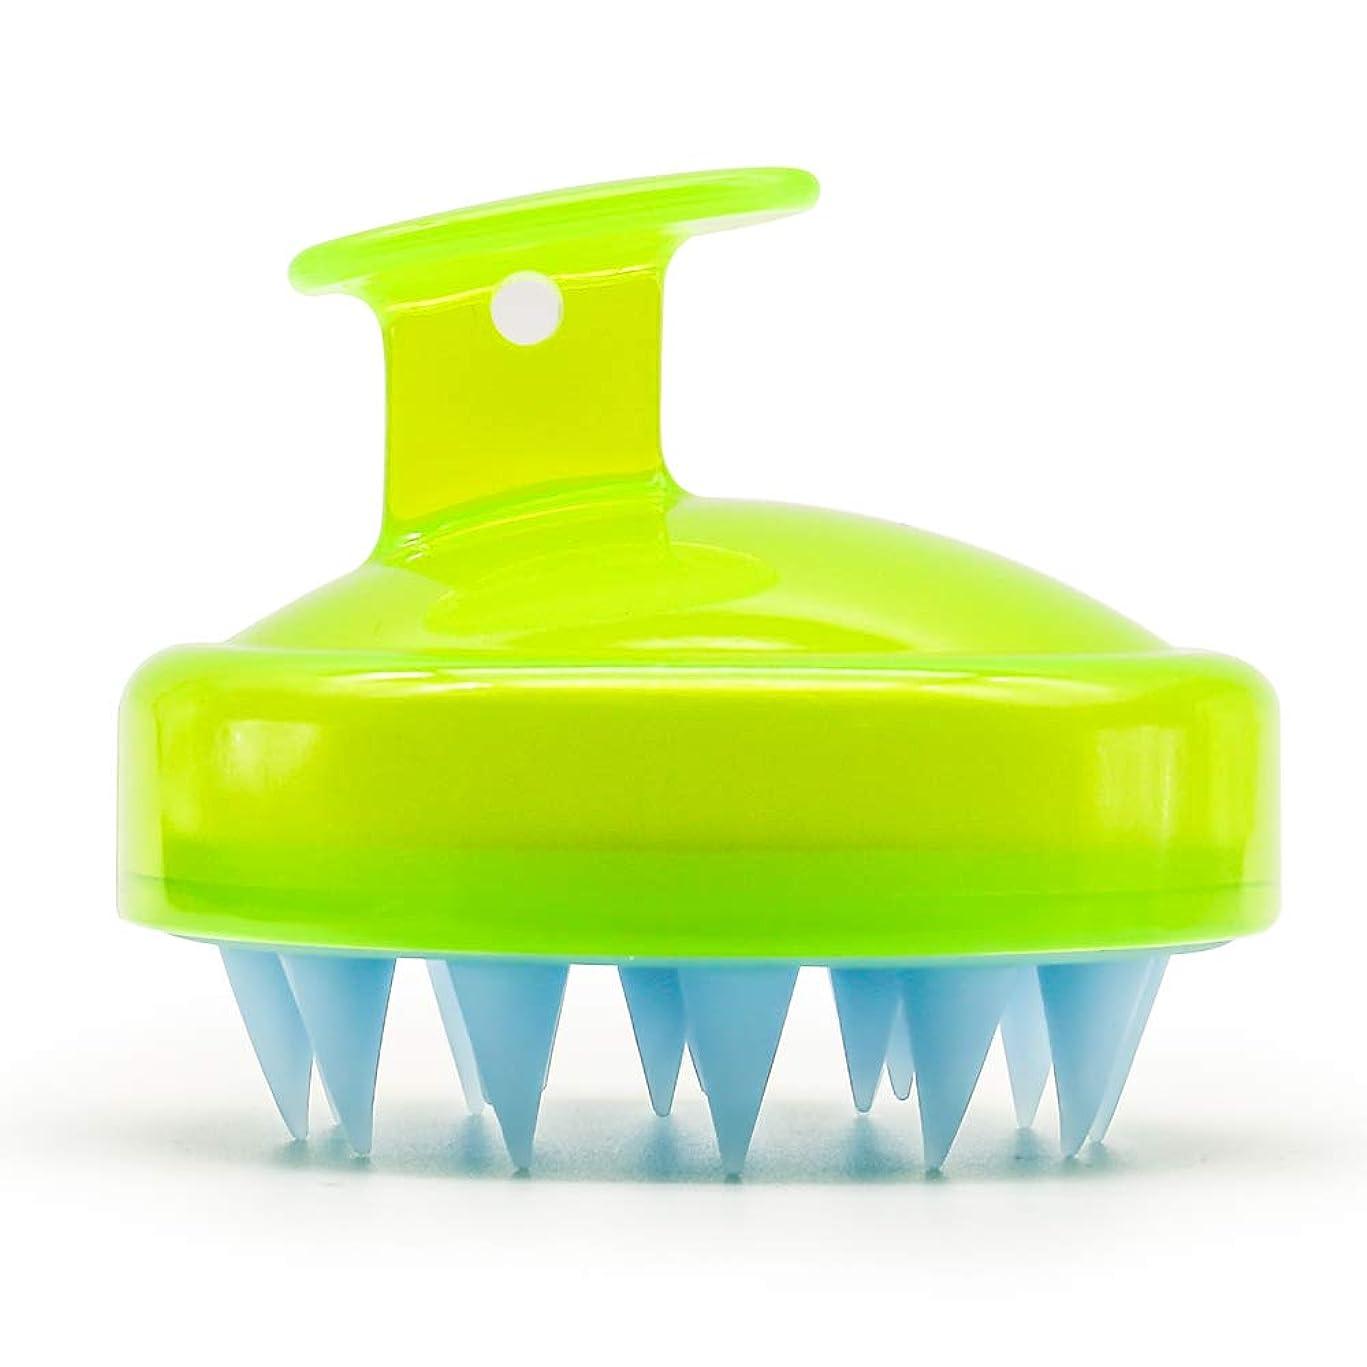 SILISCRUB - The Original Silicone Shampoo Brush(Green yellow)